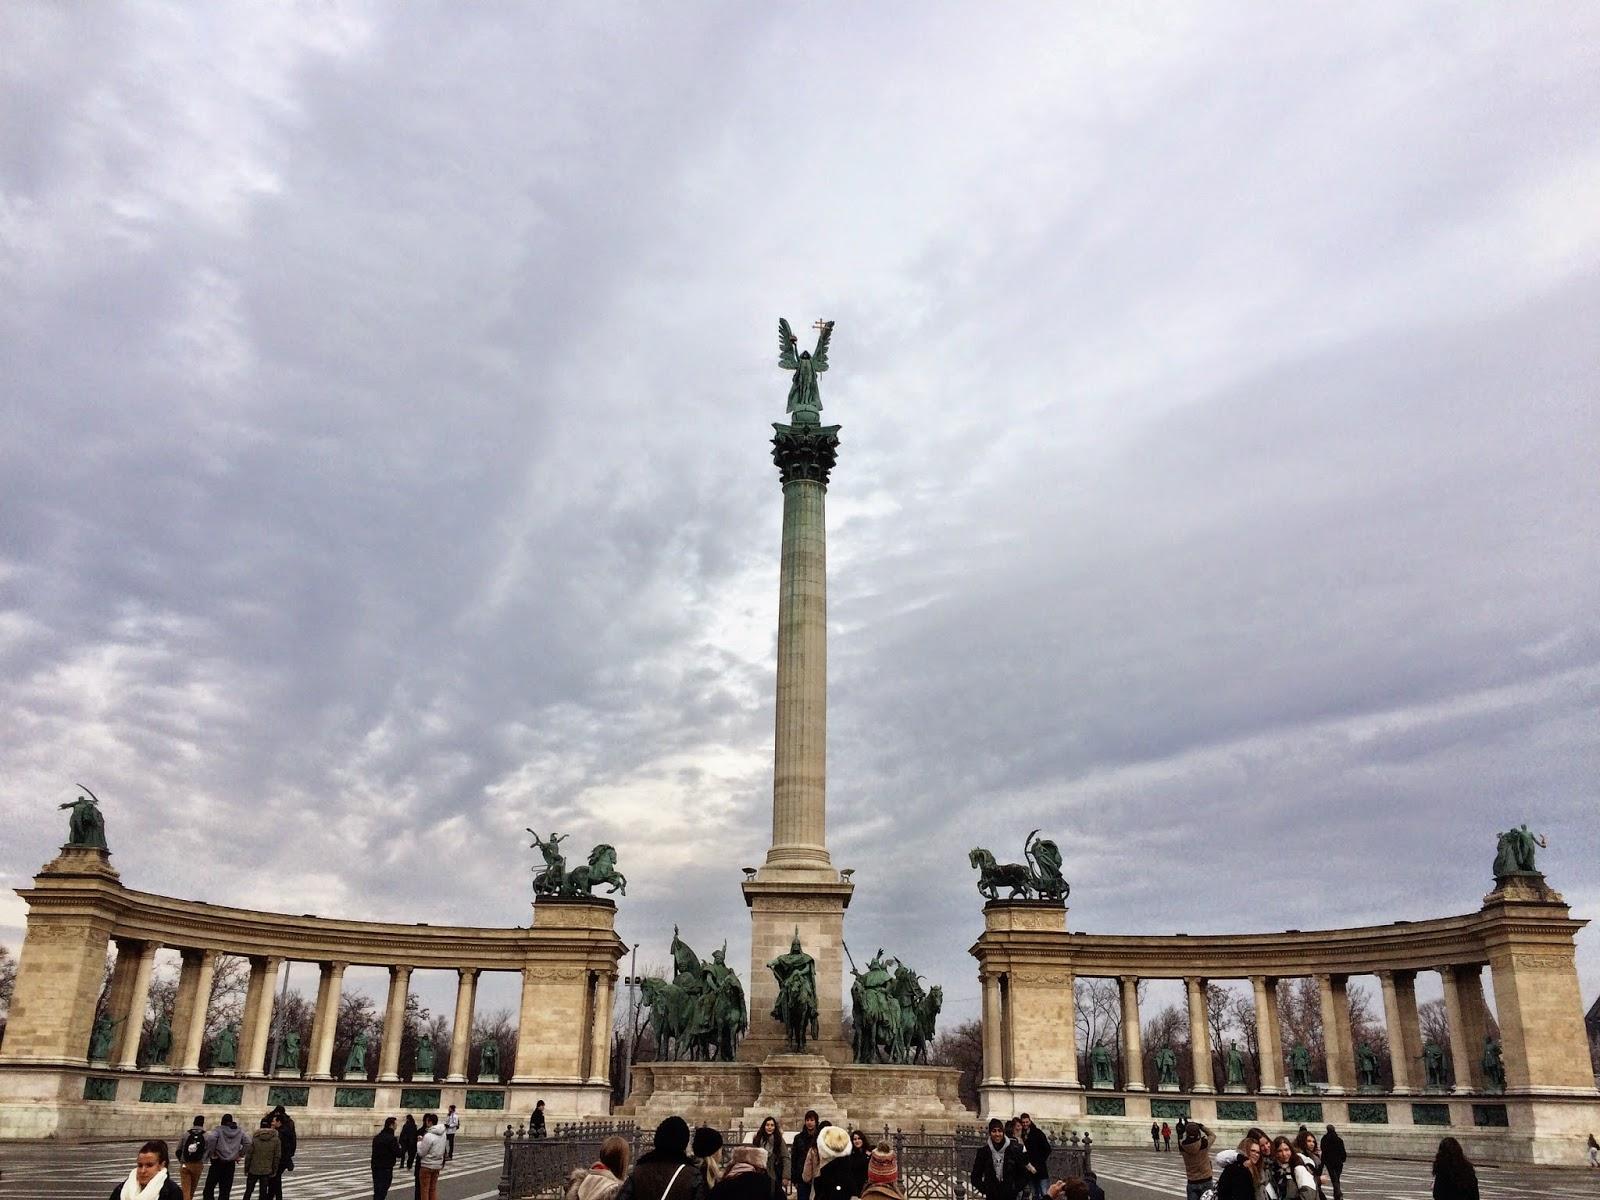 Hero's Square (Hősök tere) - Budapest